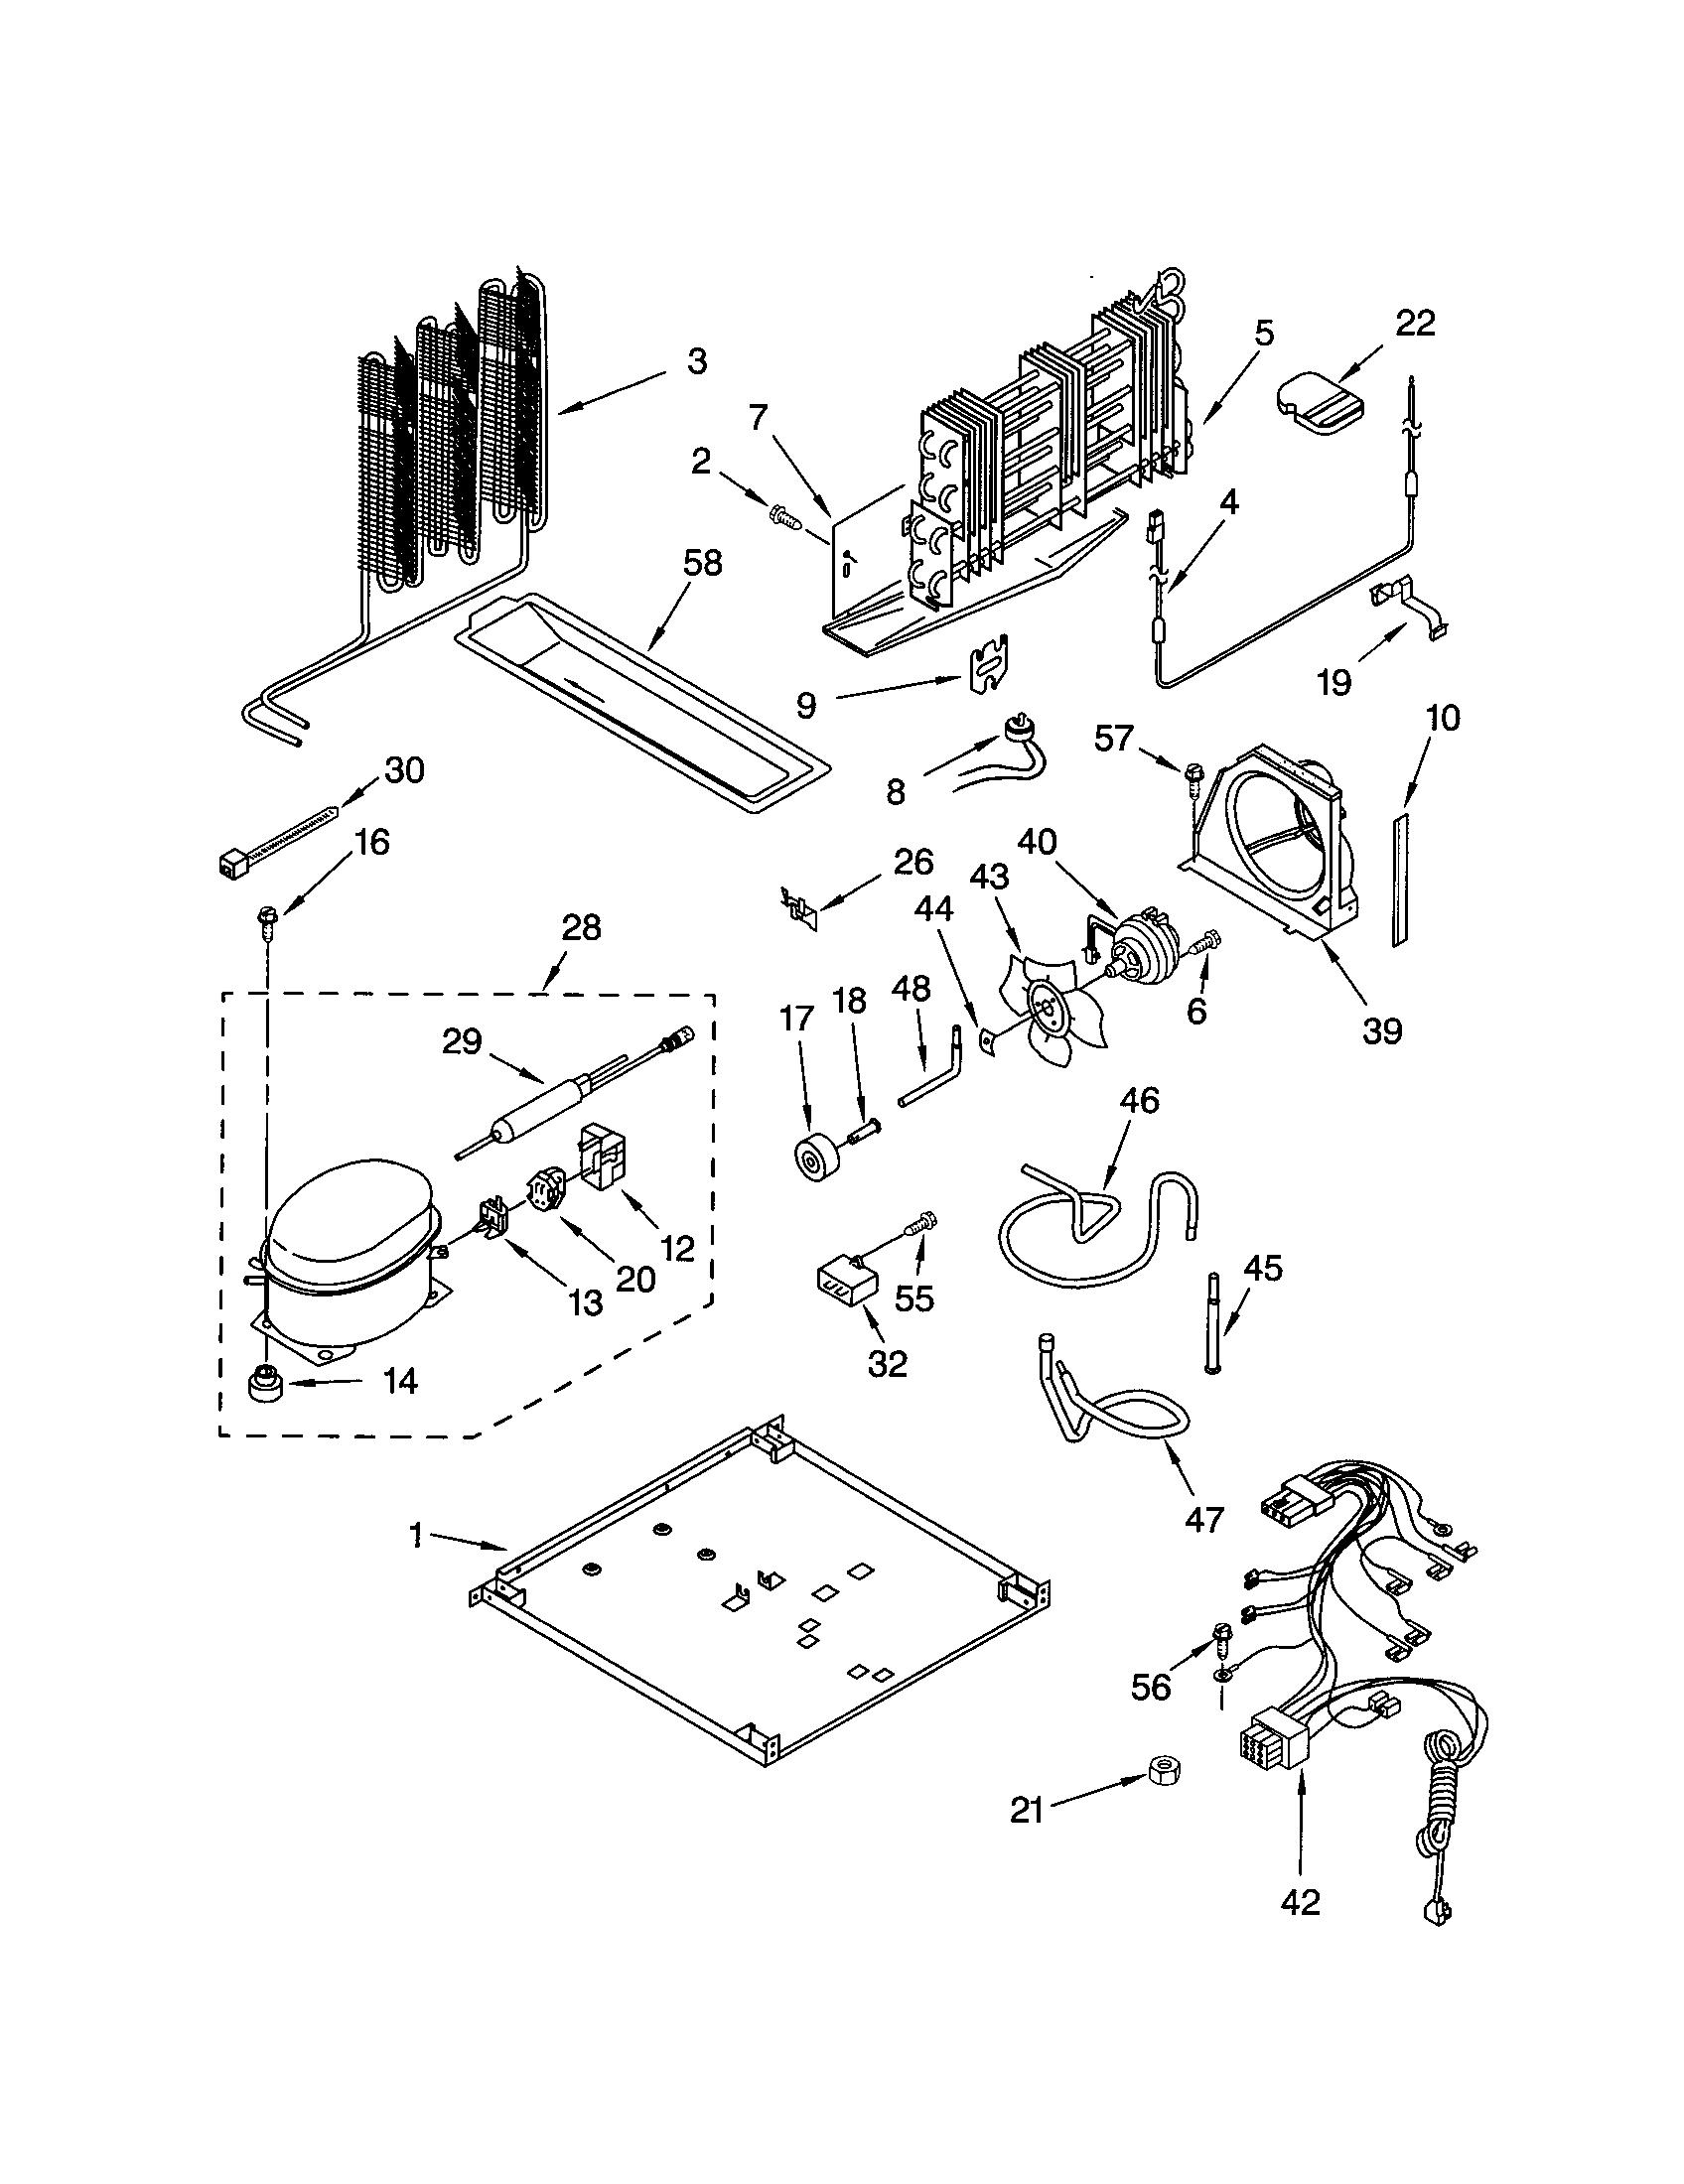 Kenmore 106 Bimetal Defrost Thermostat